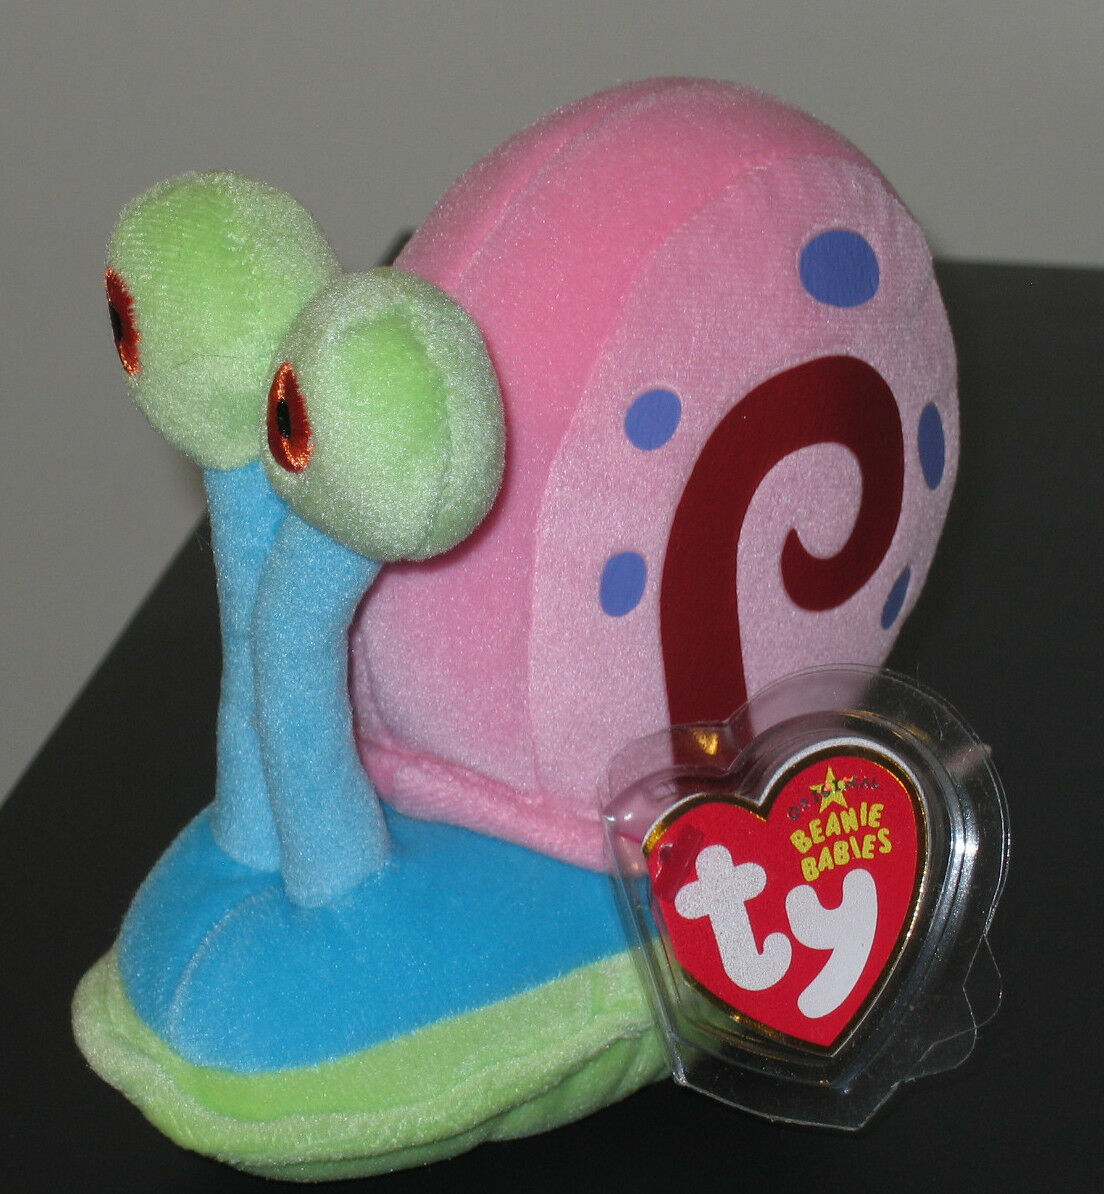 TY Beanie Baby Gary the Snail, SpongeBob SquarePants